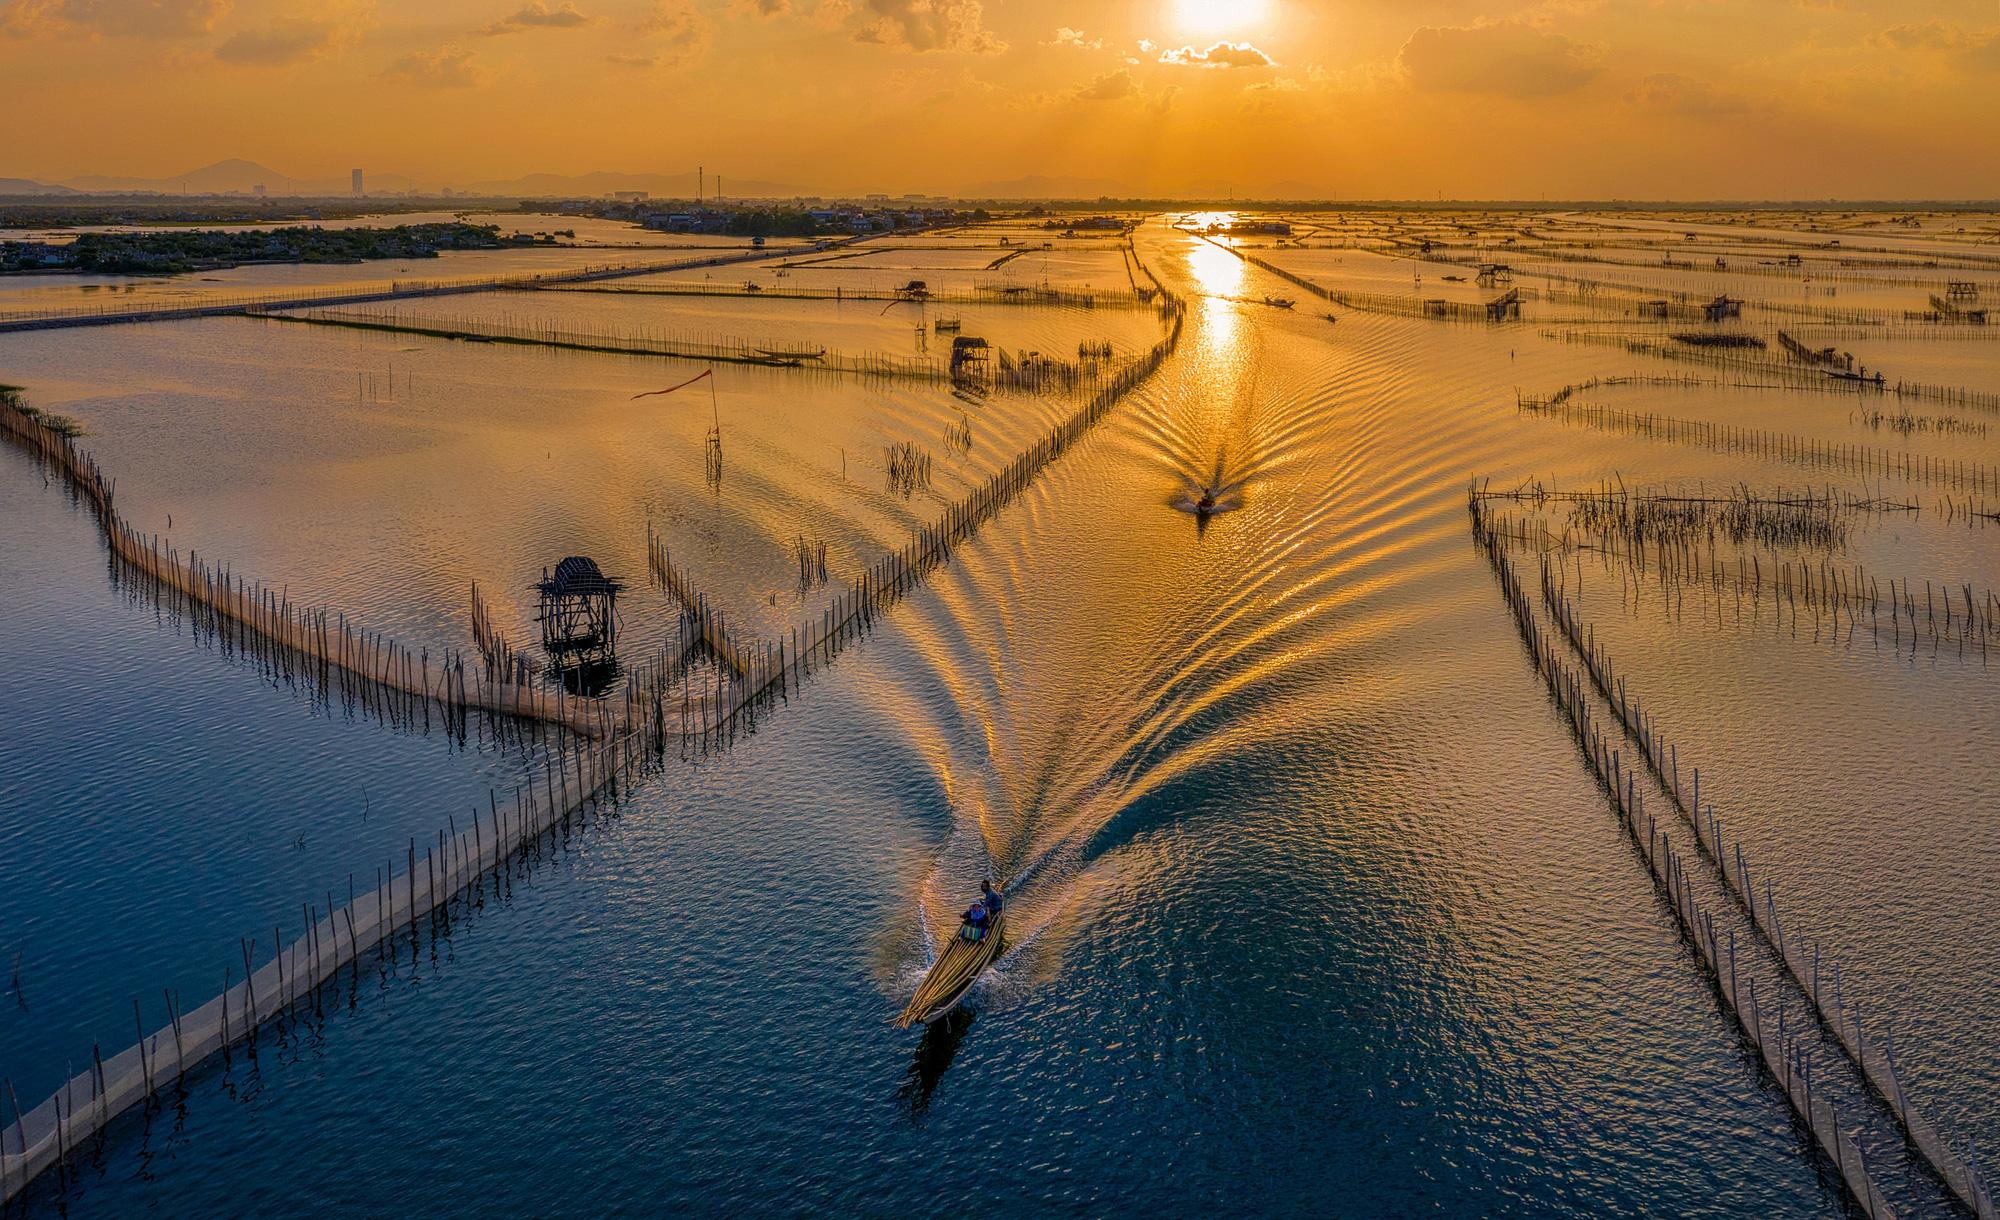 Explore the aquatic wilderness of this hidden lagoon in central Vietnam